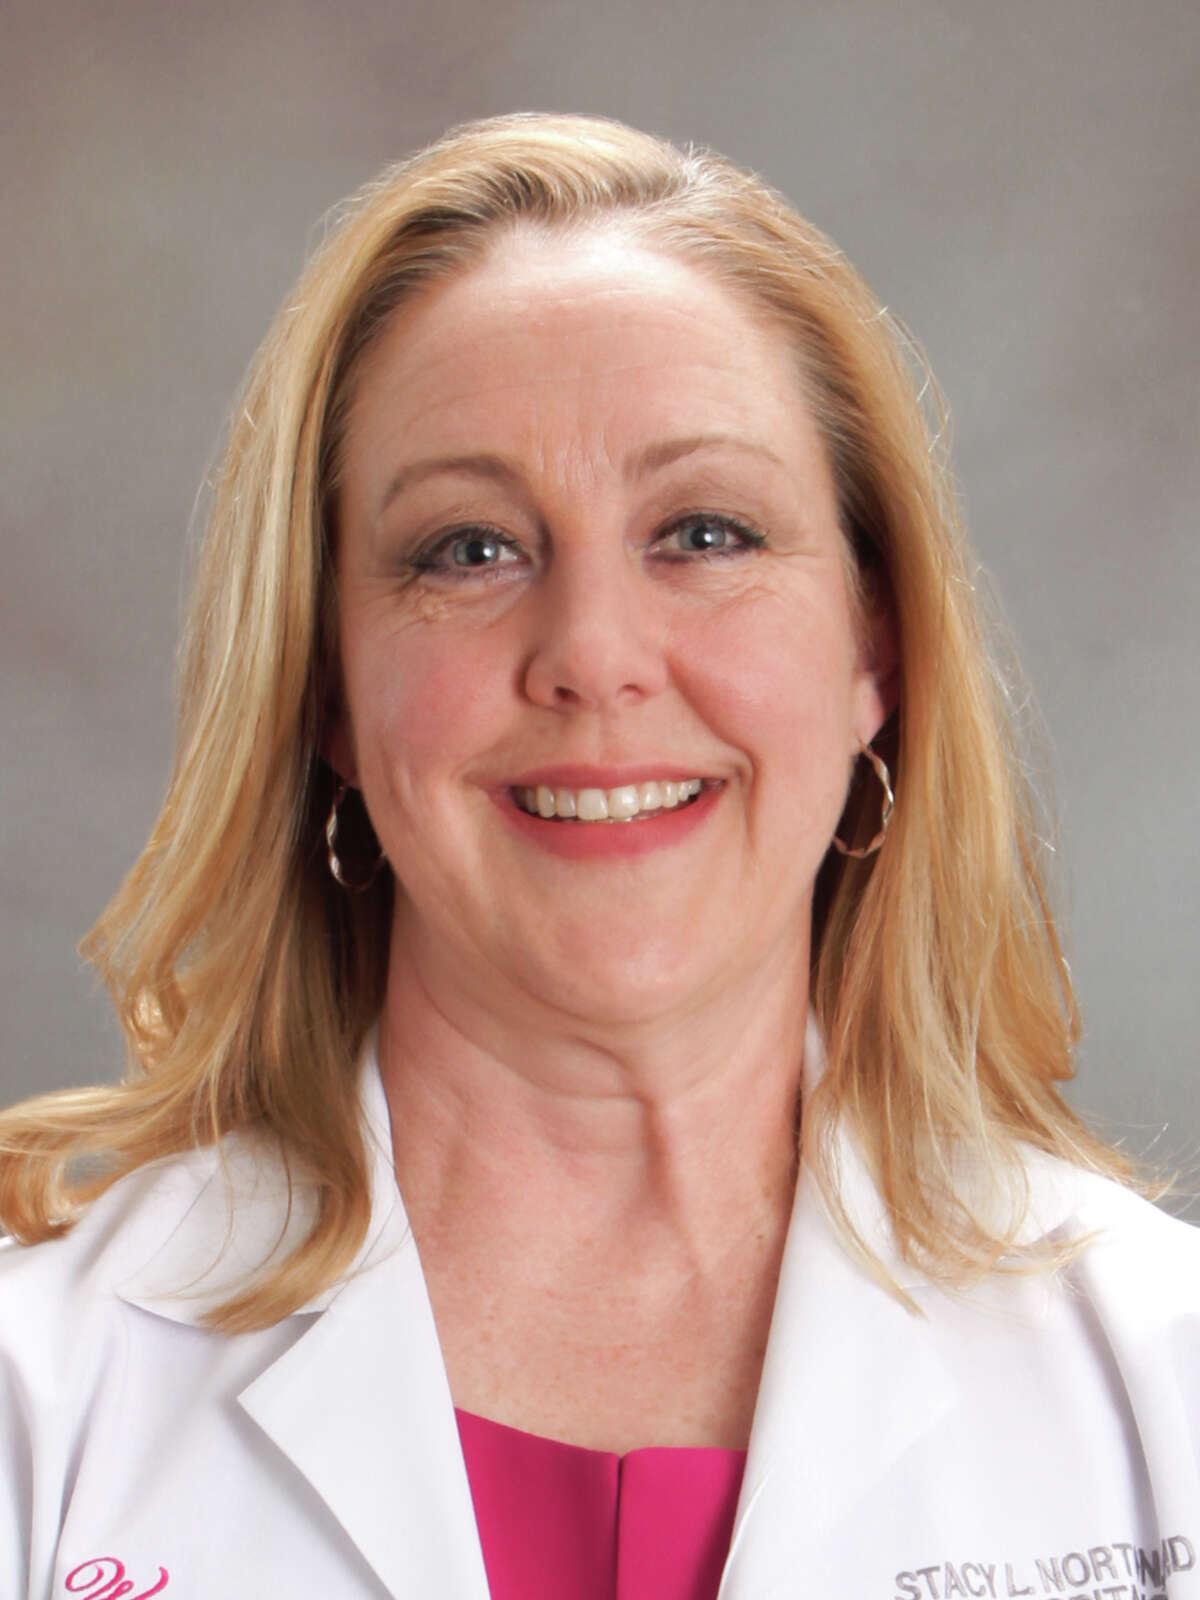 Dr. Stacy Norton